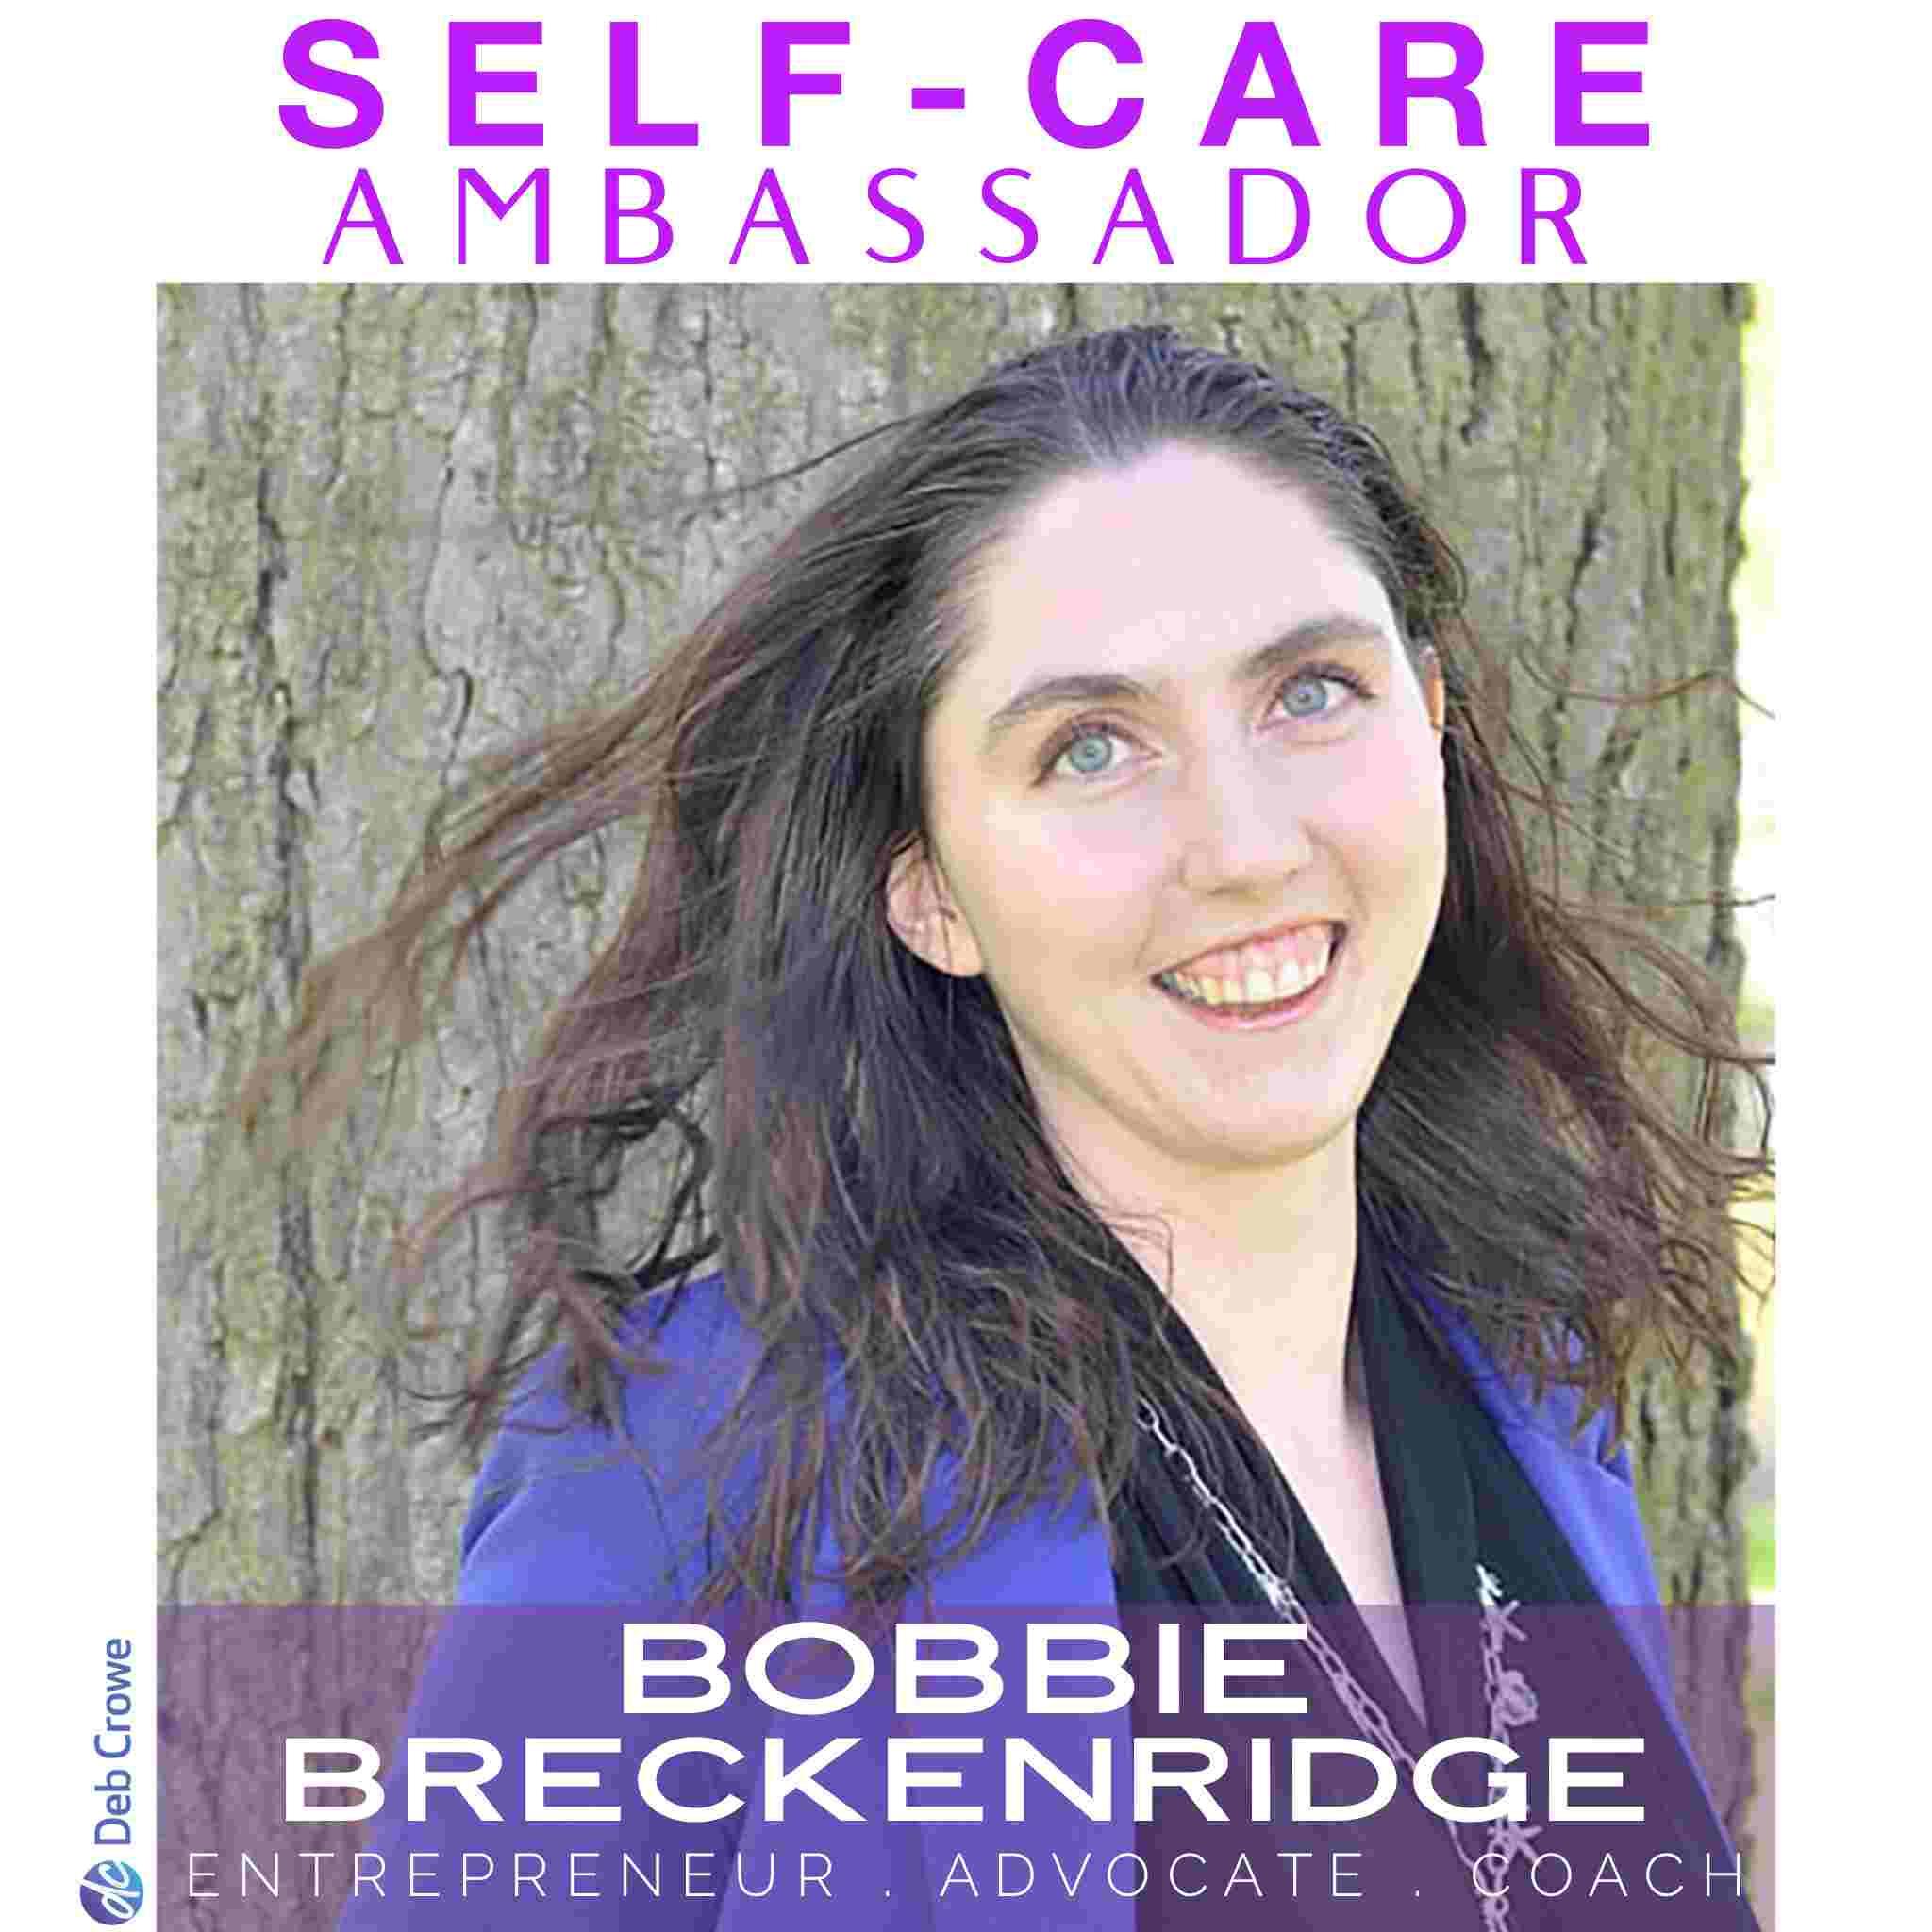 Deb Crowe Self-care Ambassador Ontario Women's Self Care Conference - Bobbie Breckenridge